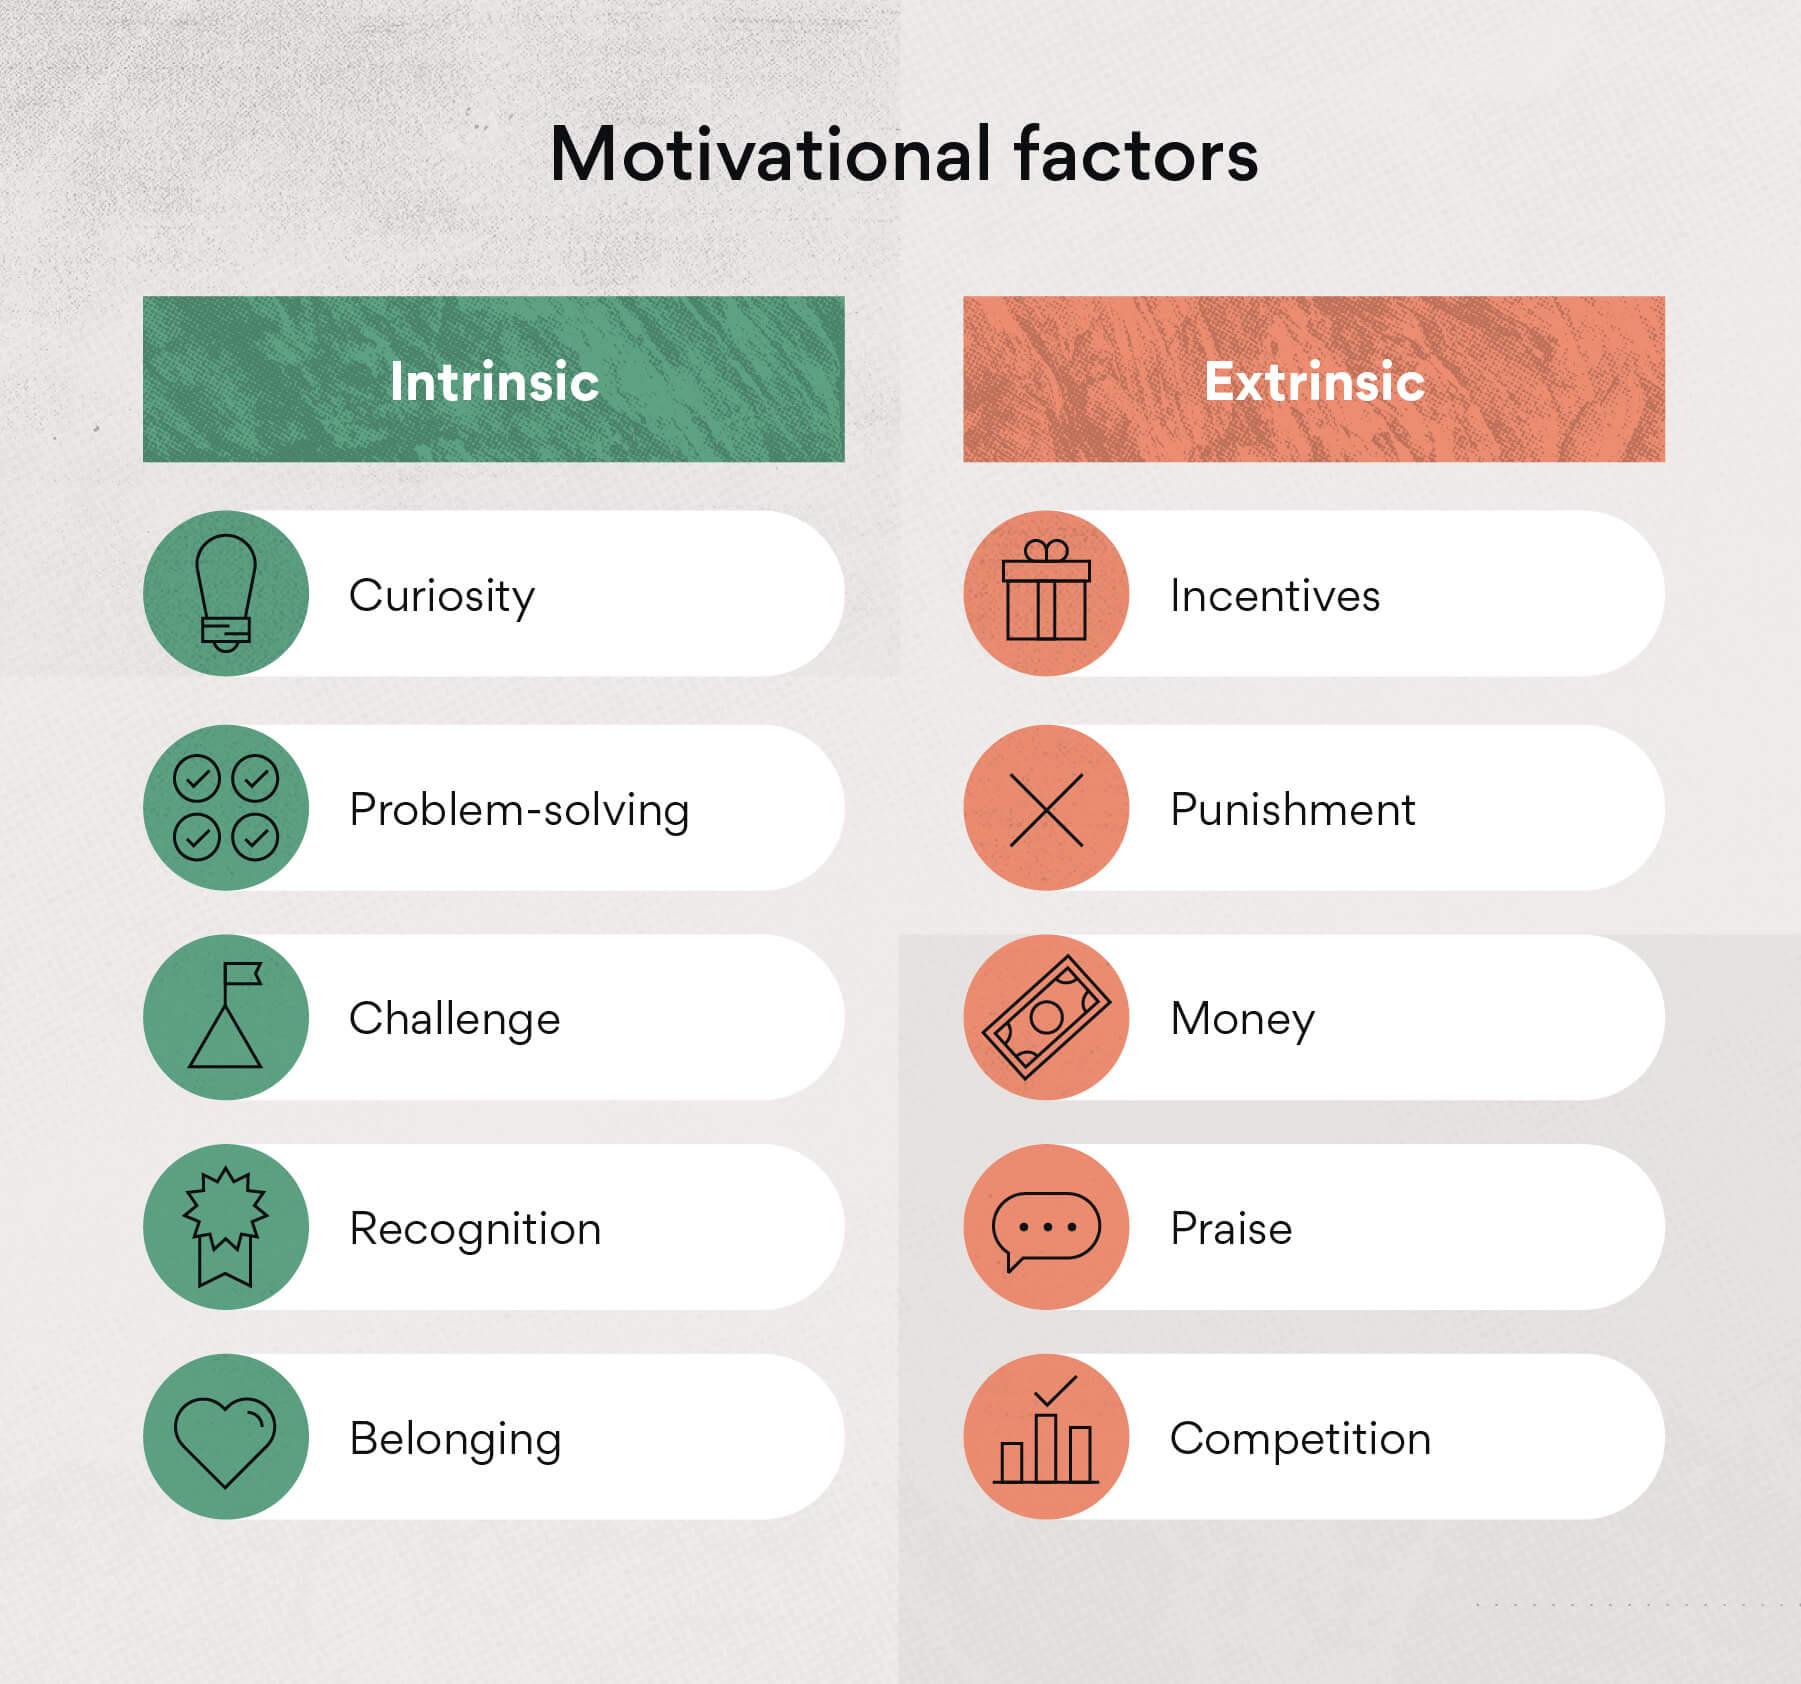 Motivational factors and impact